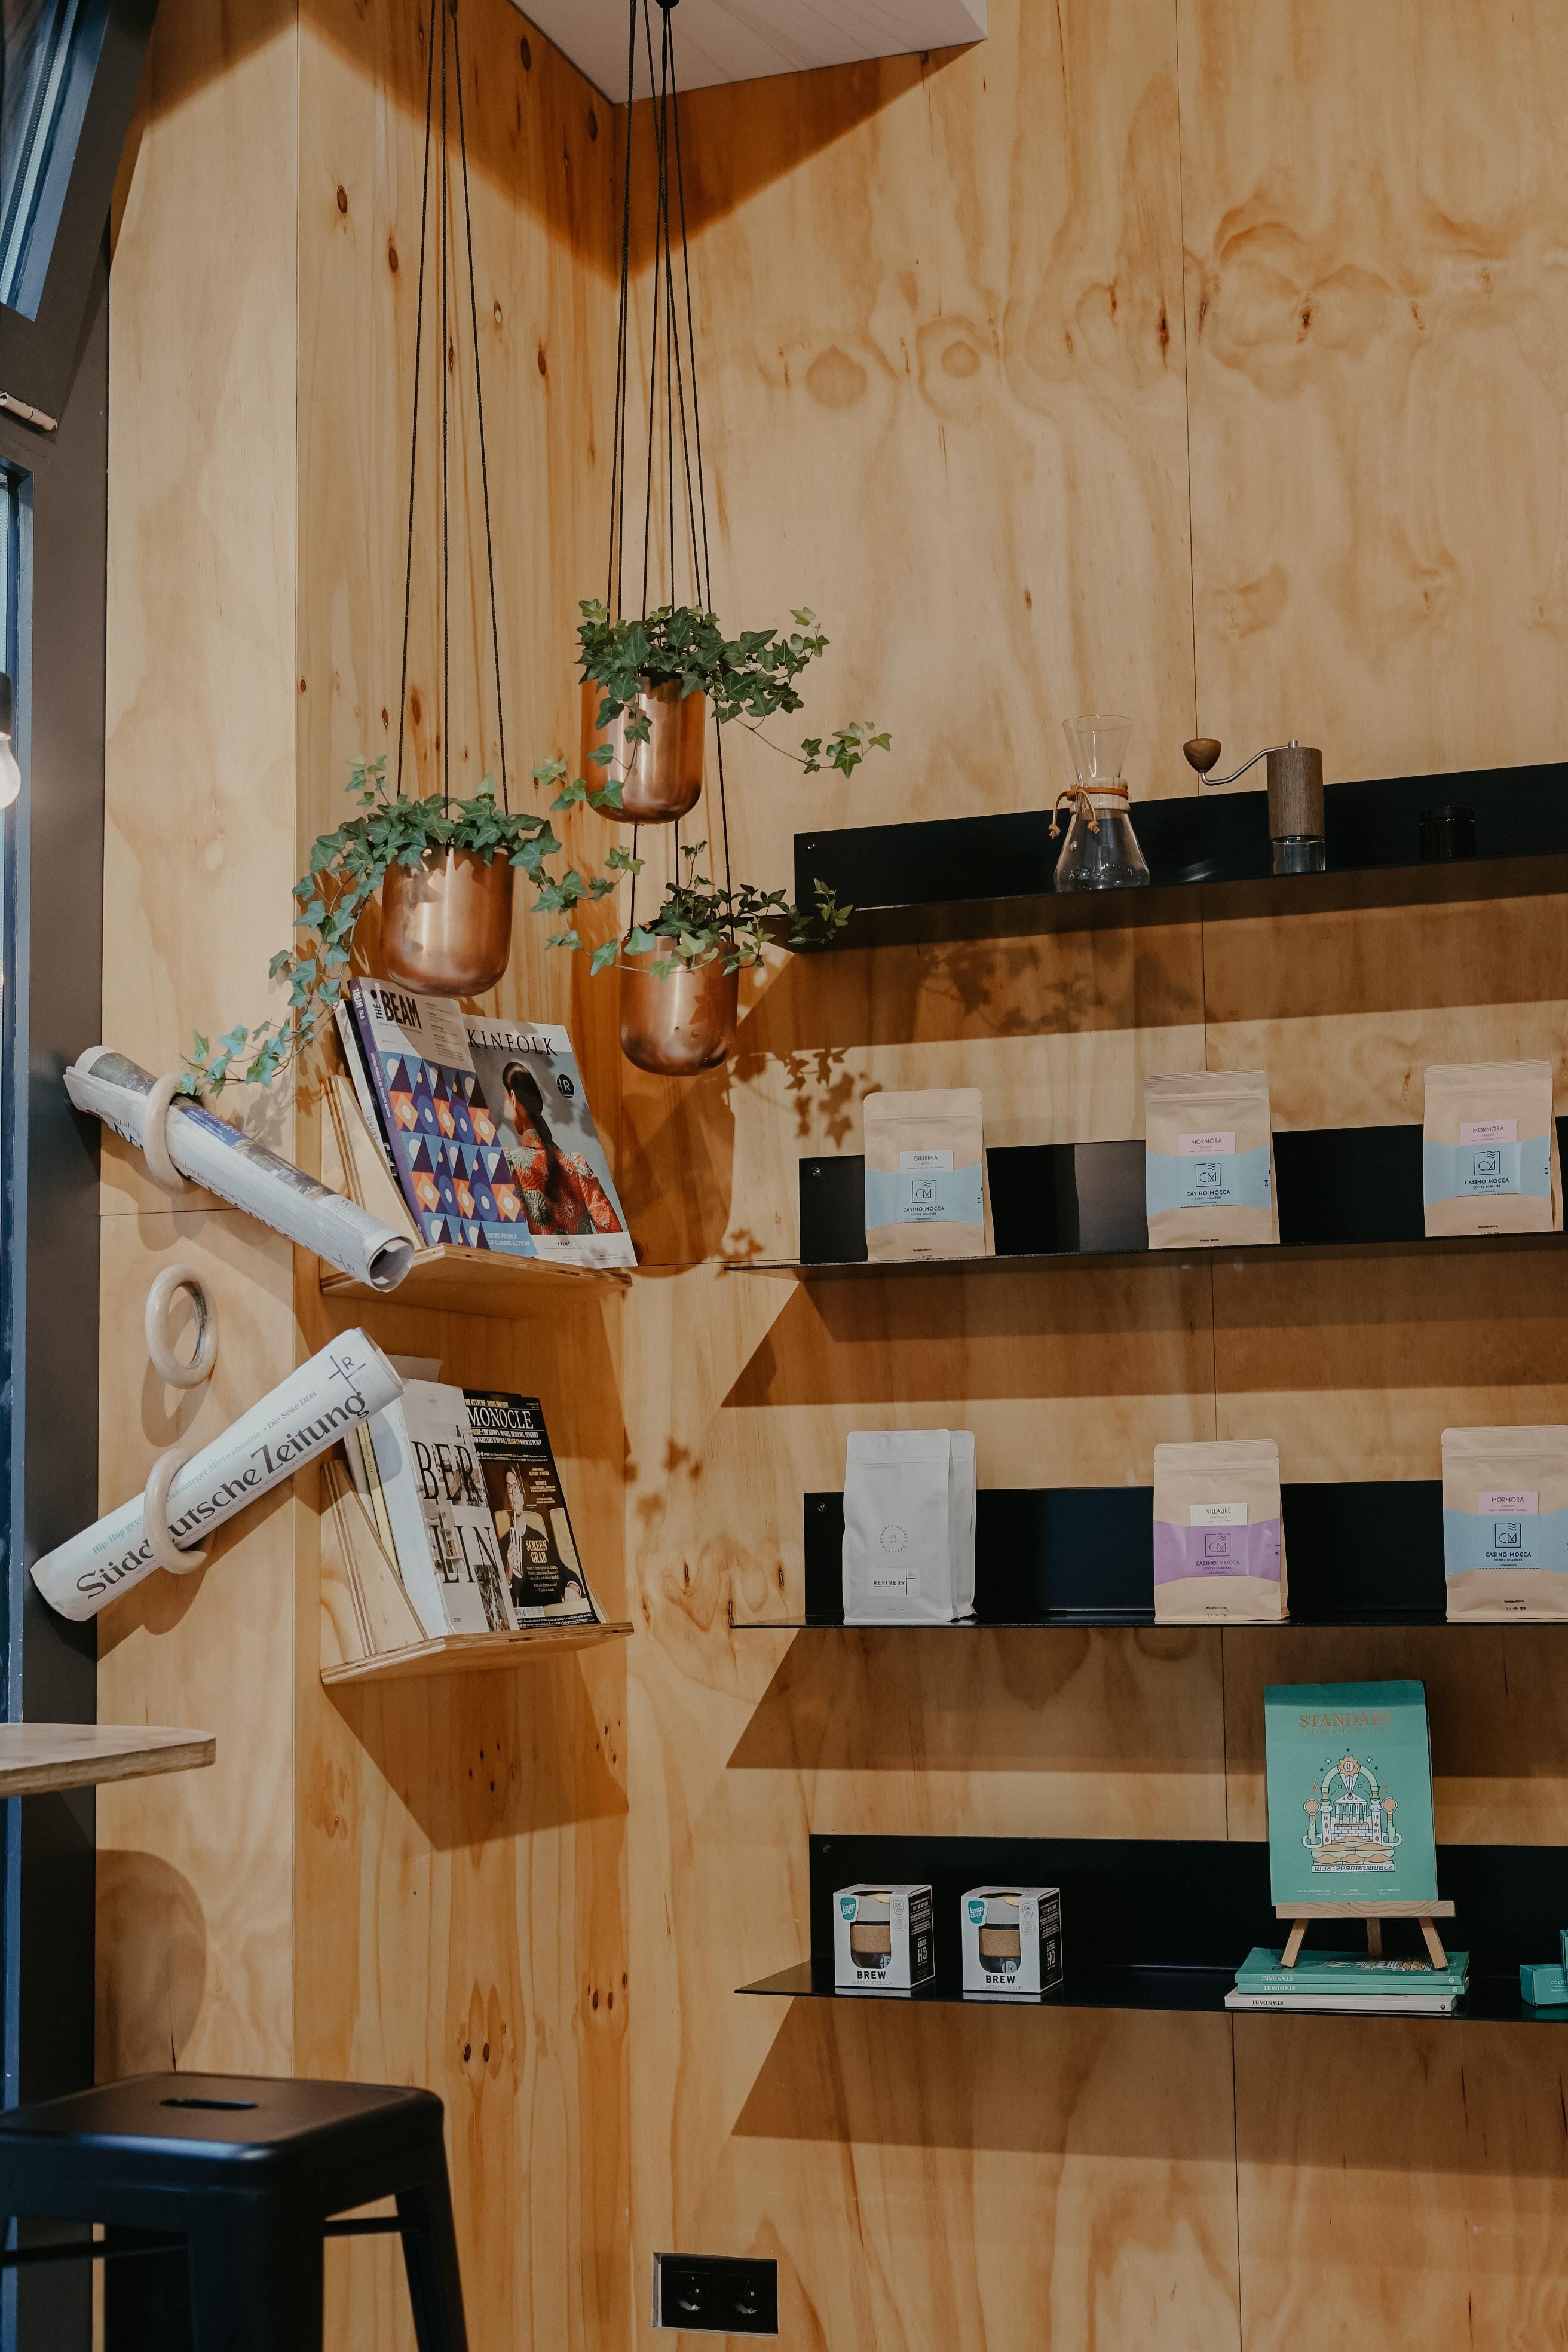 hanging plant pots near floating shelves